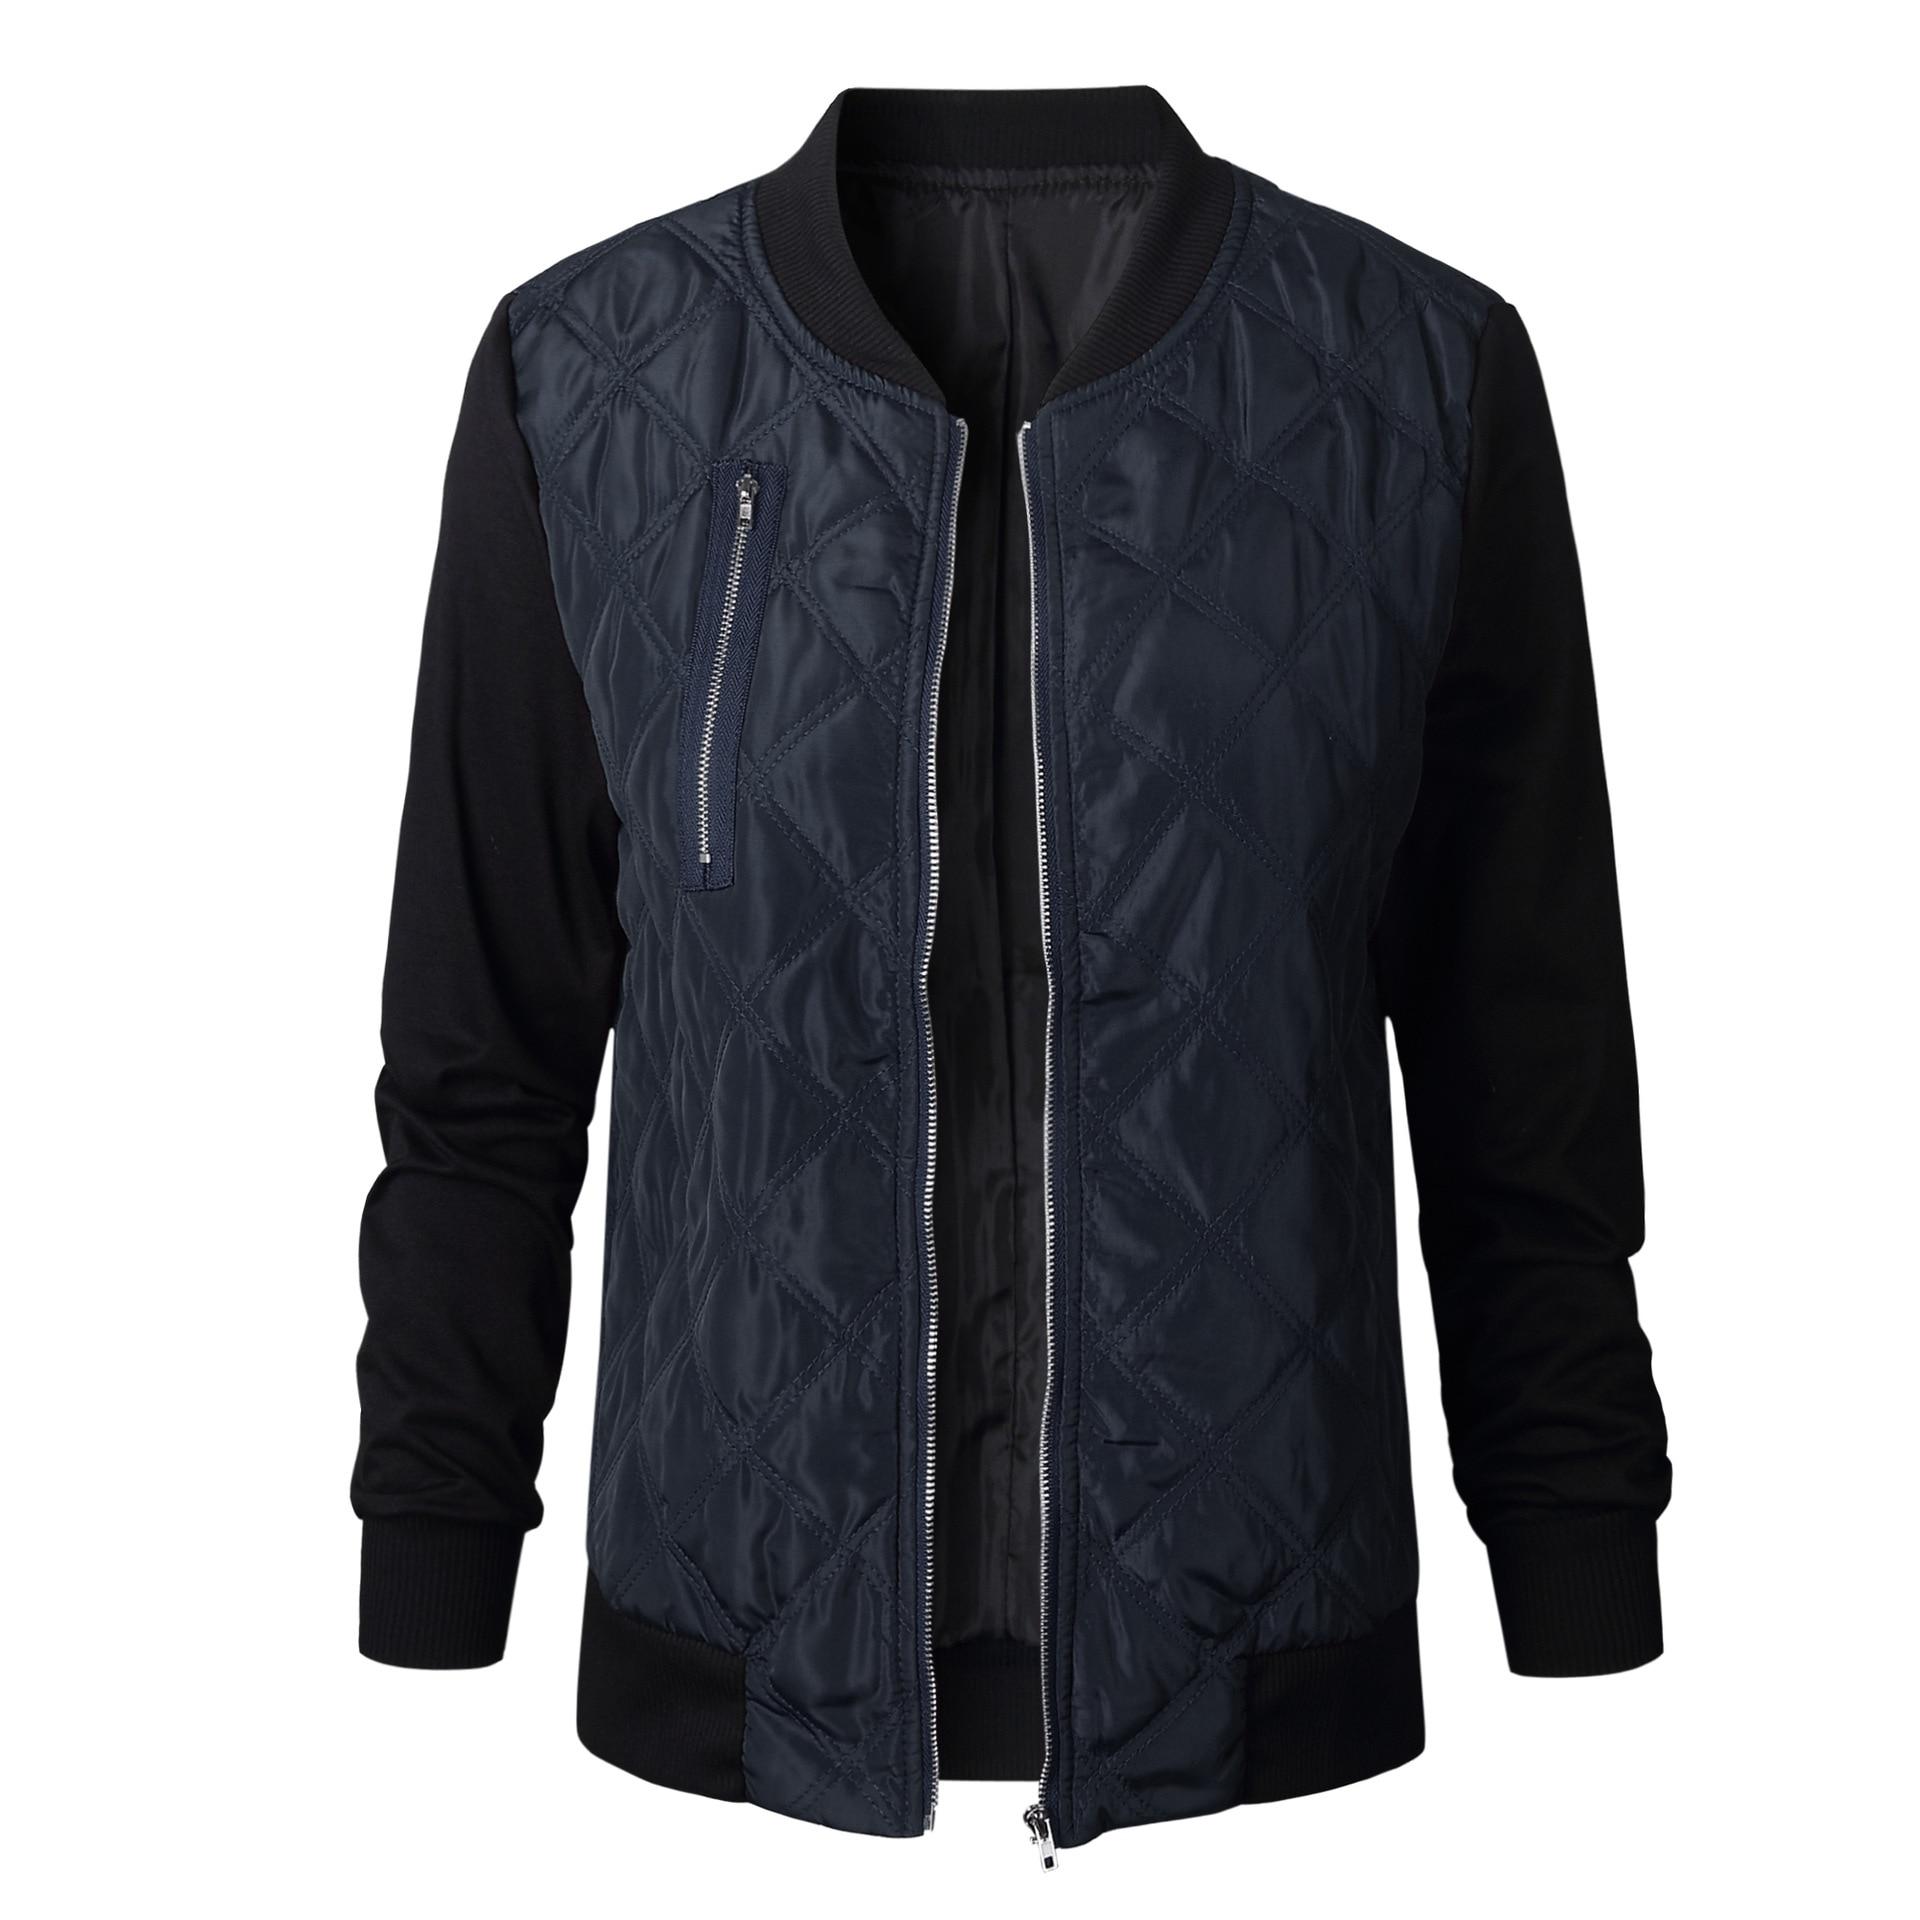 HTB1F3r.w98YBeNkSnb4q6yevFXaw Plus Size Autumn Winter Fashion Slim Women's Jacket Zipper Cardigan Splice Bomber Jackets 2019 Long Sleeve Bodycon Coats Female